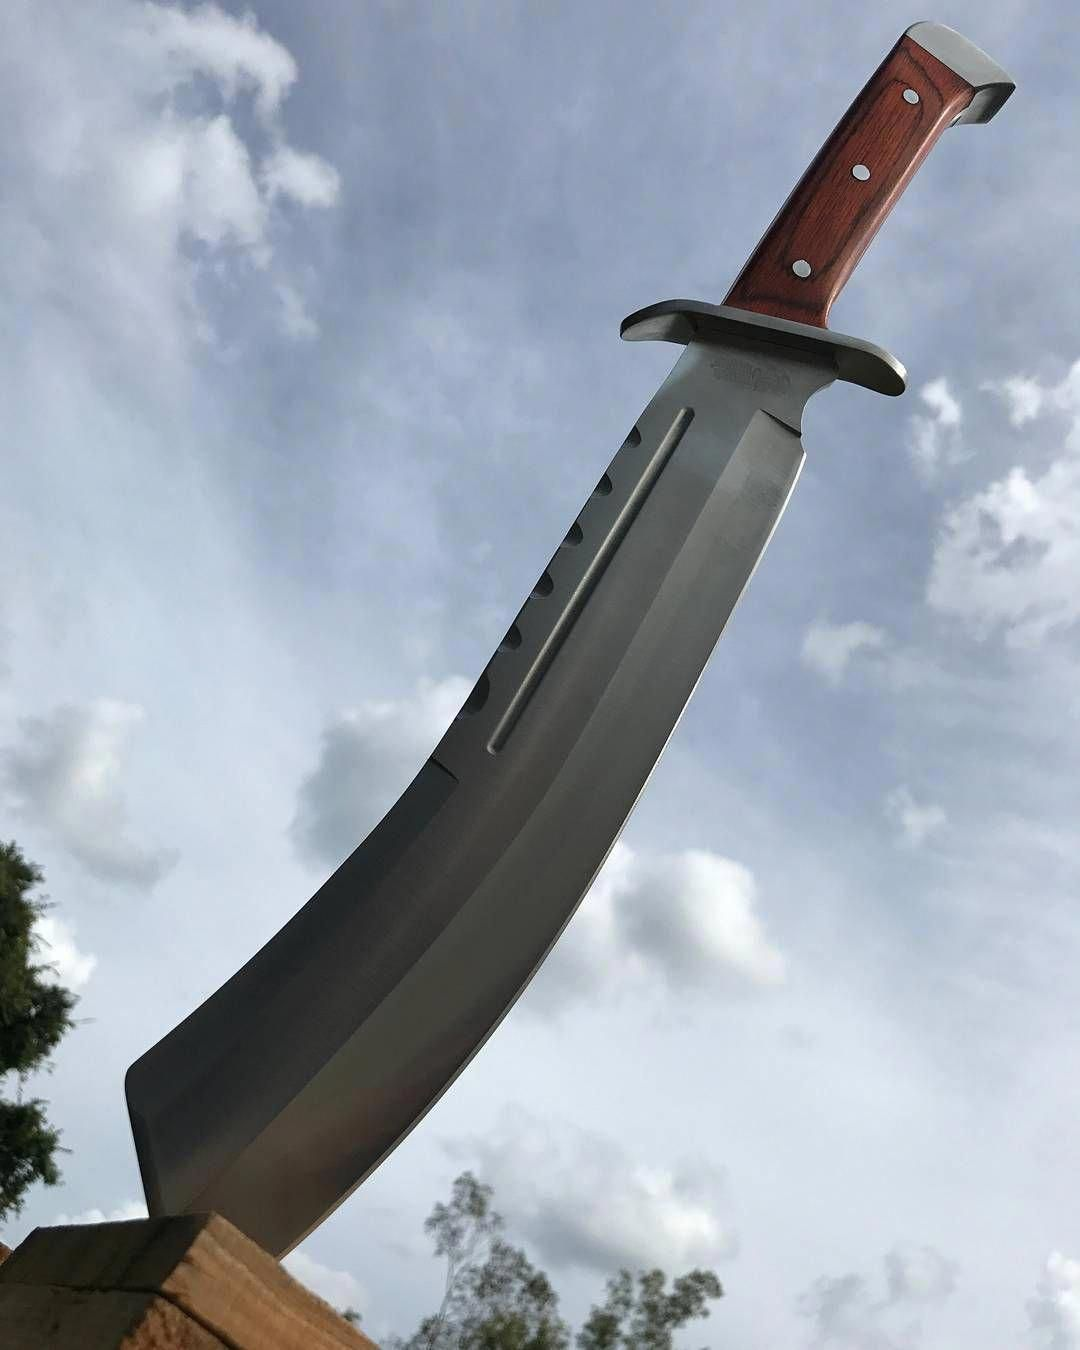 meč umenie online dating kvíz